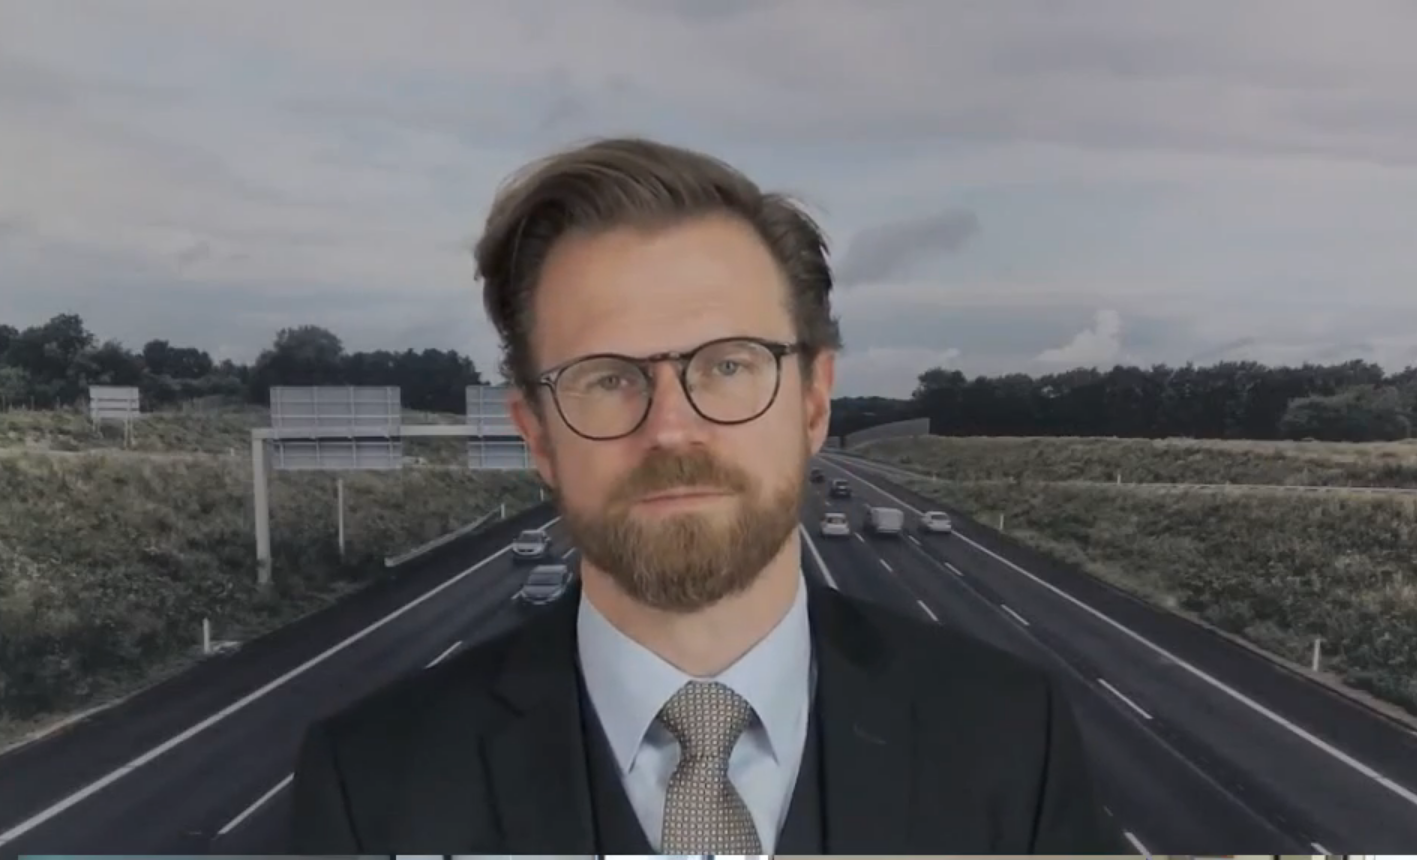 Transportminister Benny Engelbrecht ved webinaret hos DI Transport.